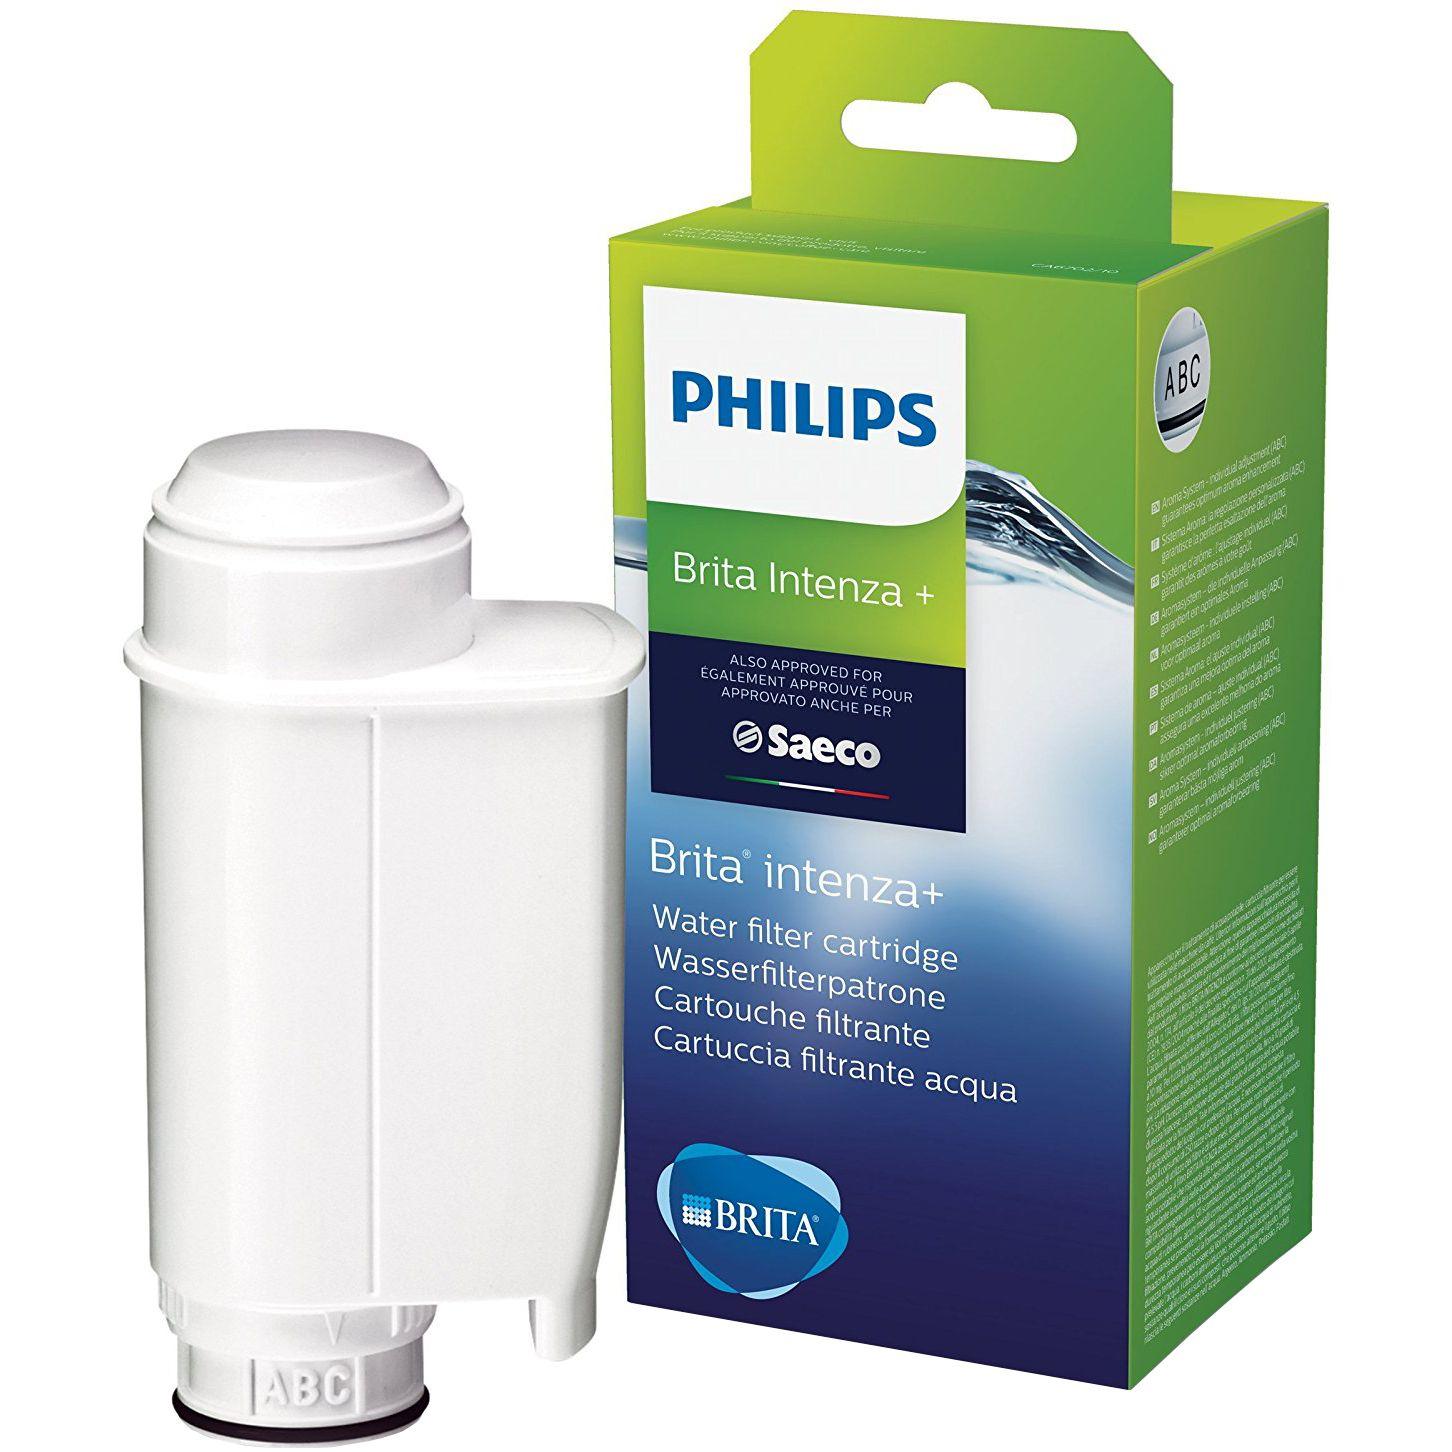 Brita Intenza+; Filtr do ekspresów do kawy Philips/Saeco